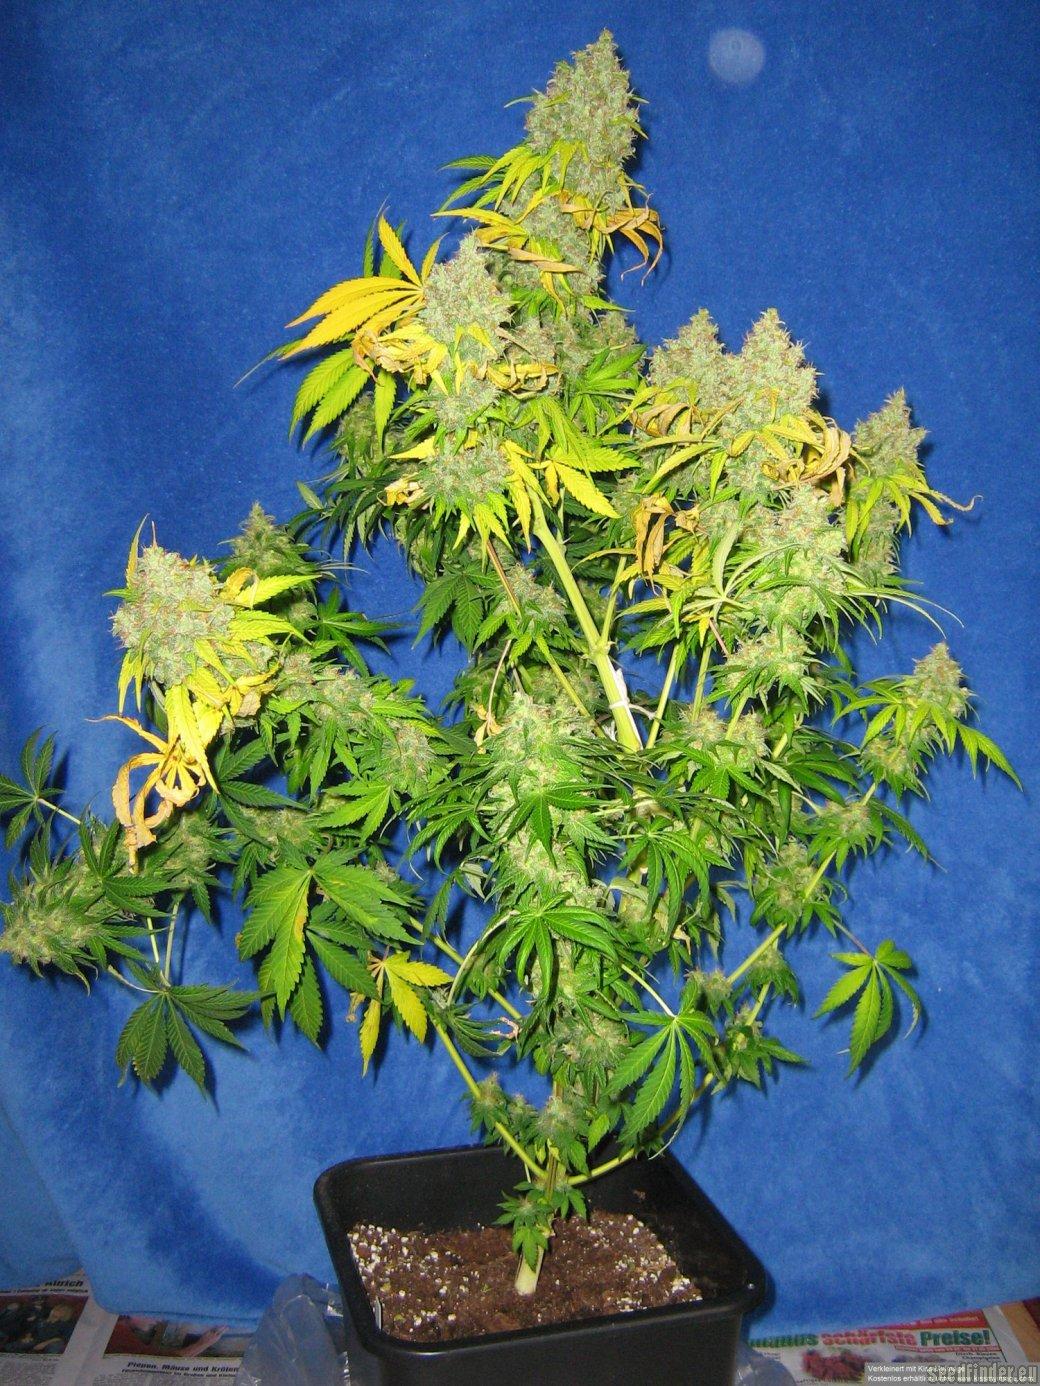 K2 Nirvana Seeds Cannabis Strain Info